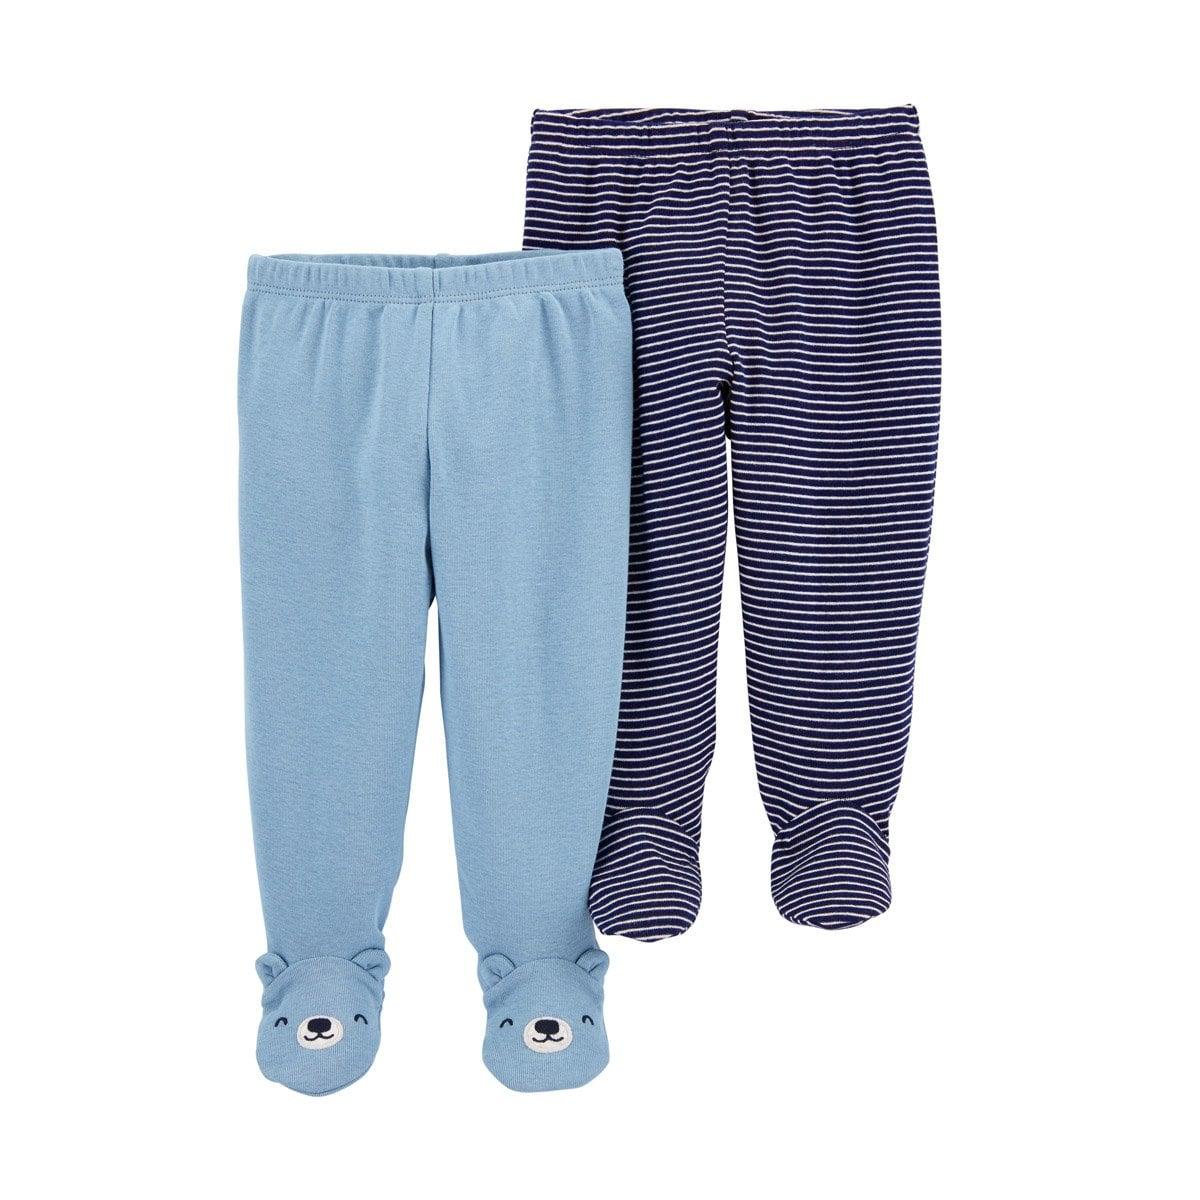 Set 2 Pantalones Azul Para Bebe Carters Modelo 1i733710